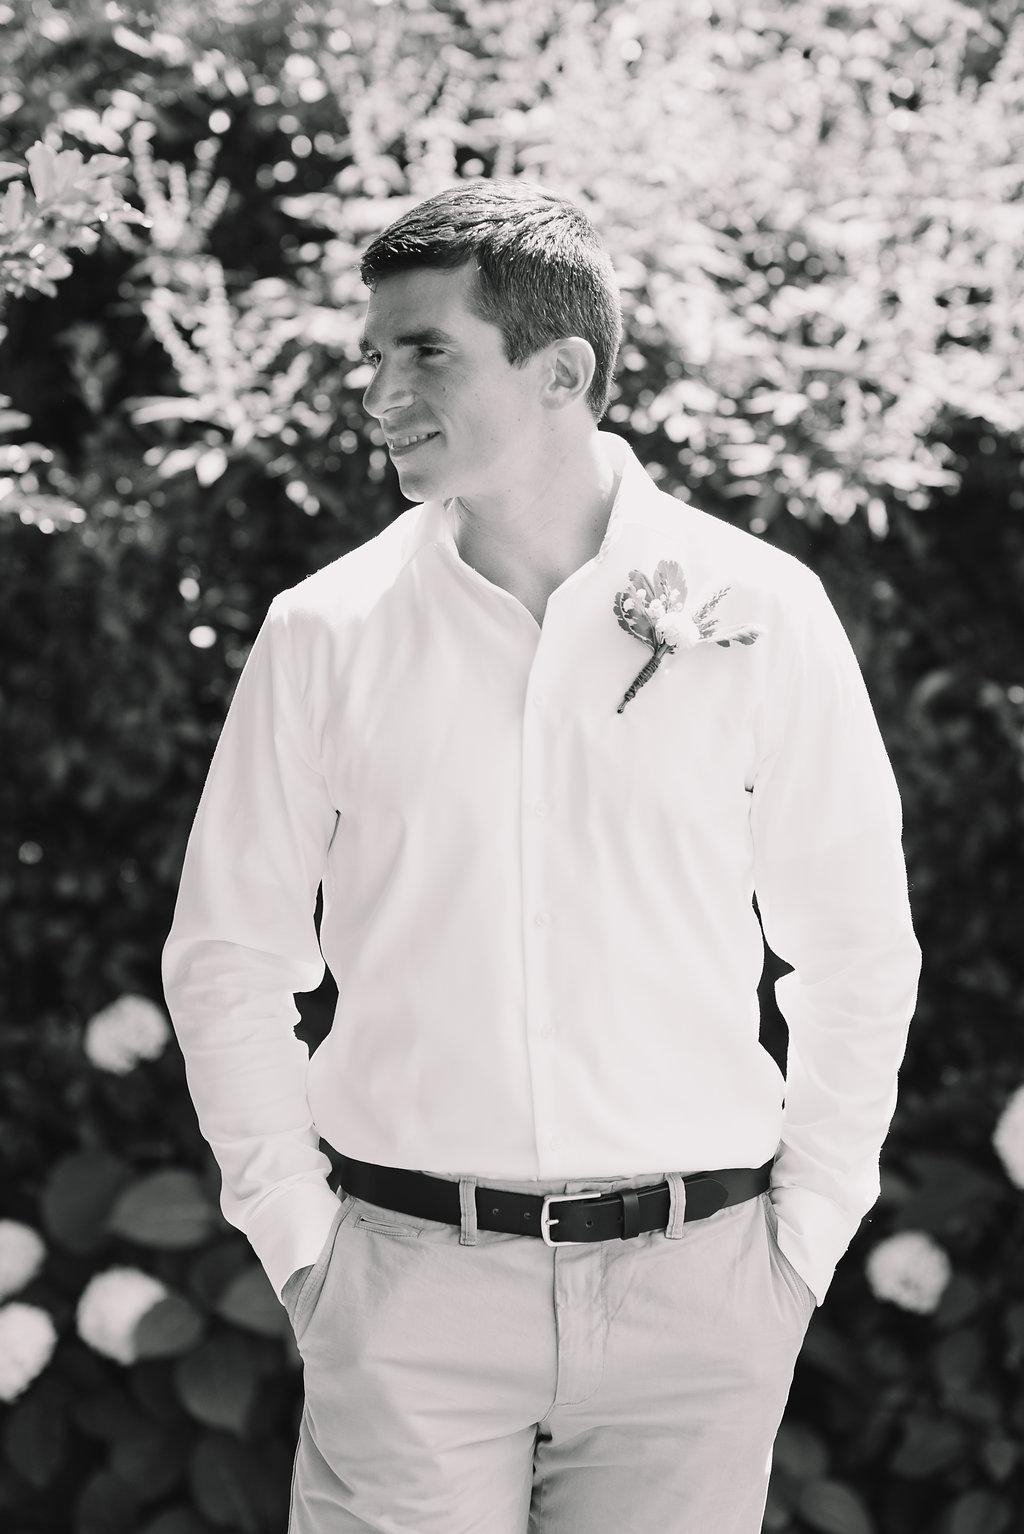 NormanPhotoPaper_PondMcPhersonPituch_Wedding-131.jpg